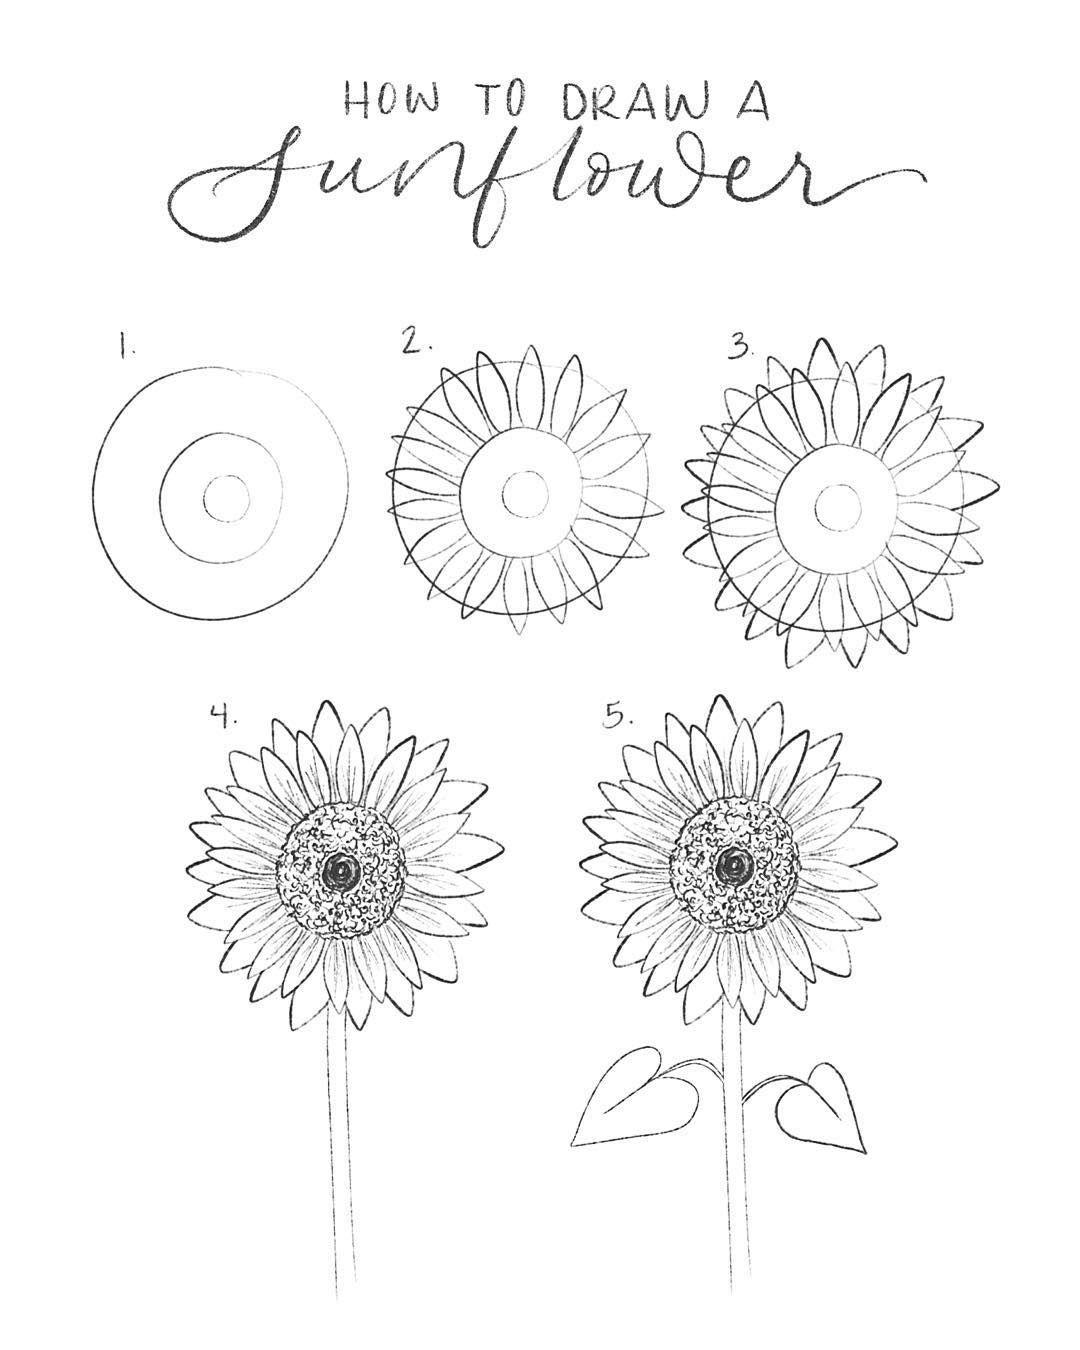 Cartoon Drawing Tips Drawing On Demand Girasoles Dibujo Como Dibujar Flores Dibujos